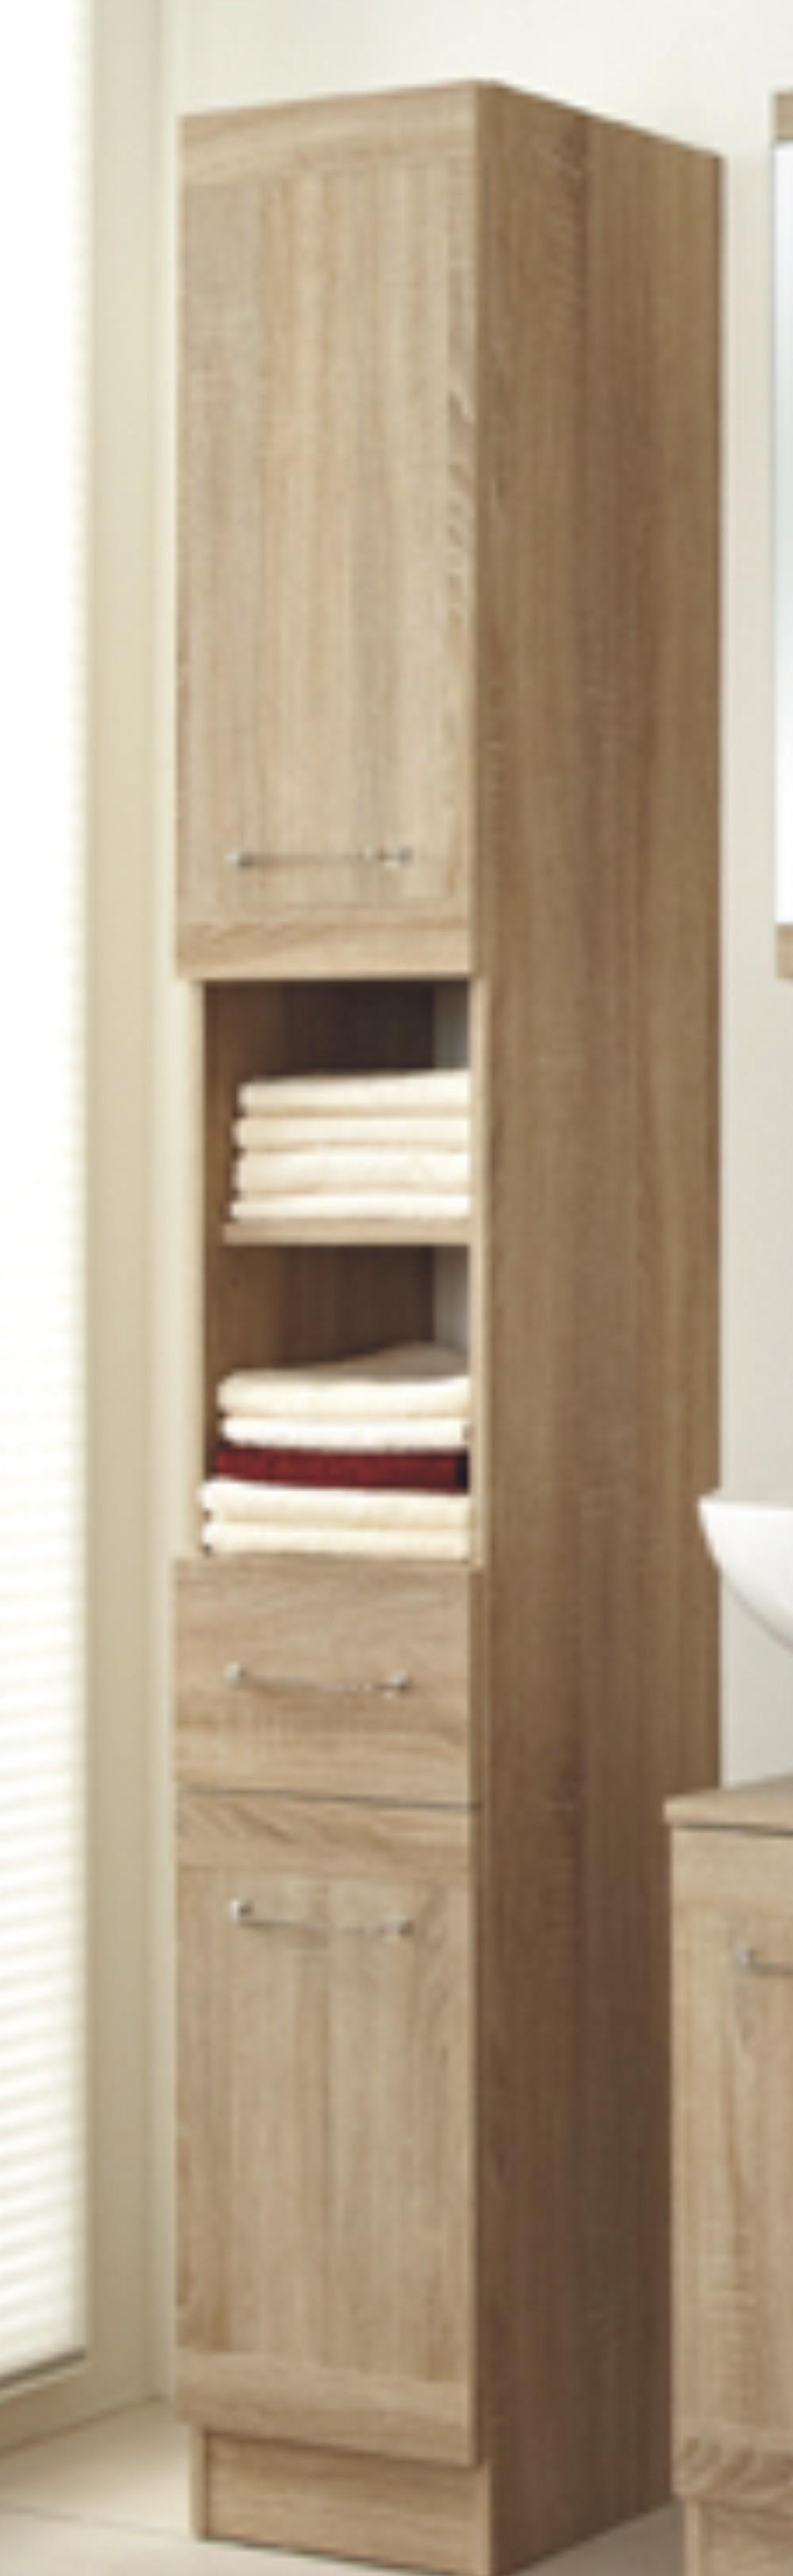 pelipal luanda hochschrank breite 30 cm arcom center. Black Bedroom Furniture Sets. Home Design Ideas